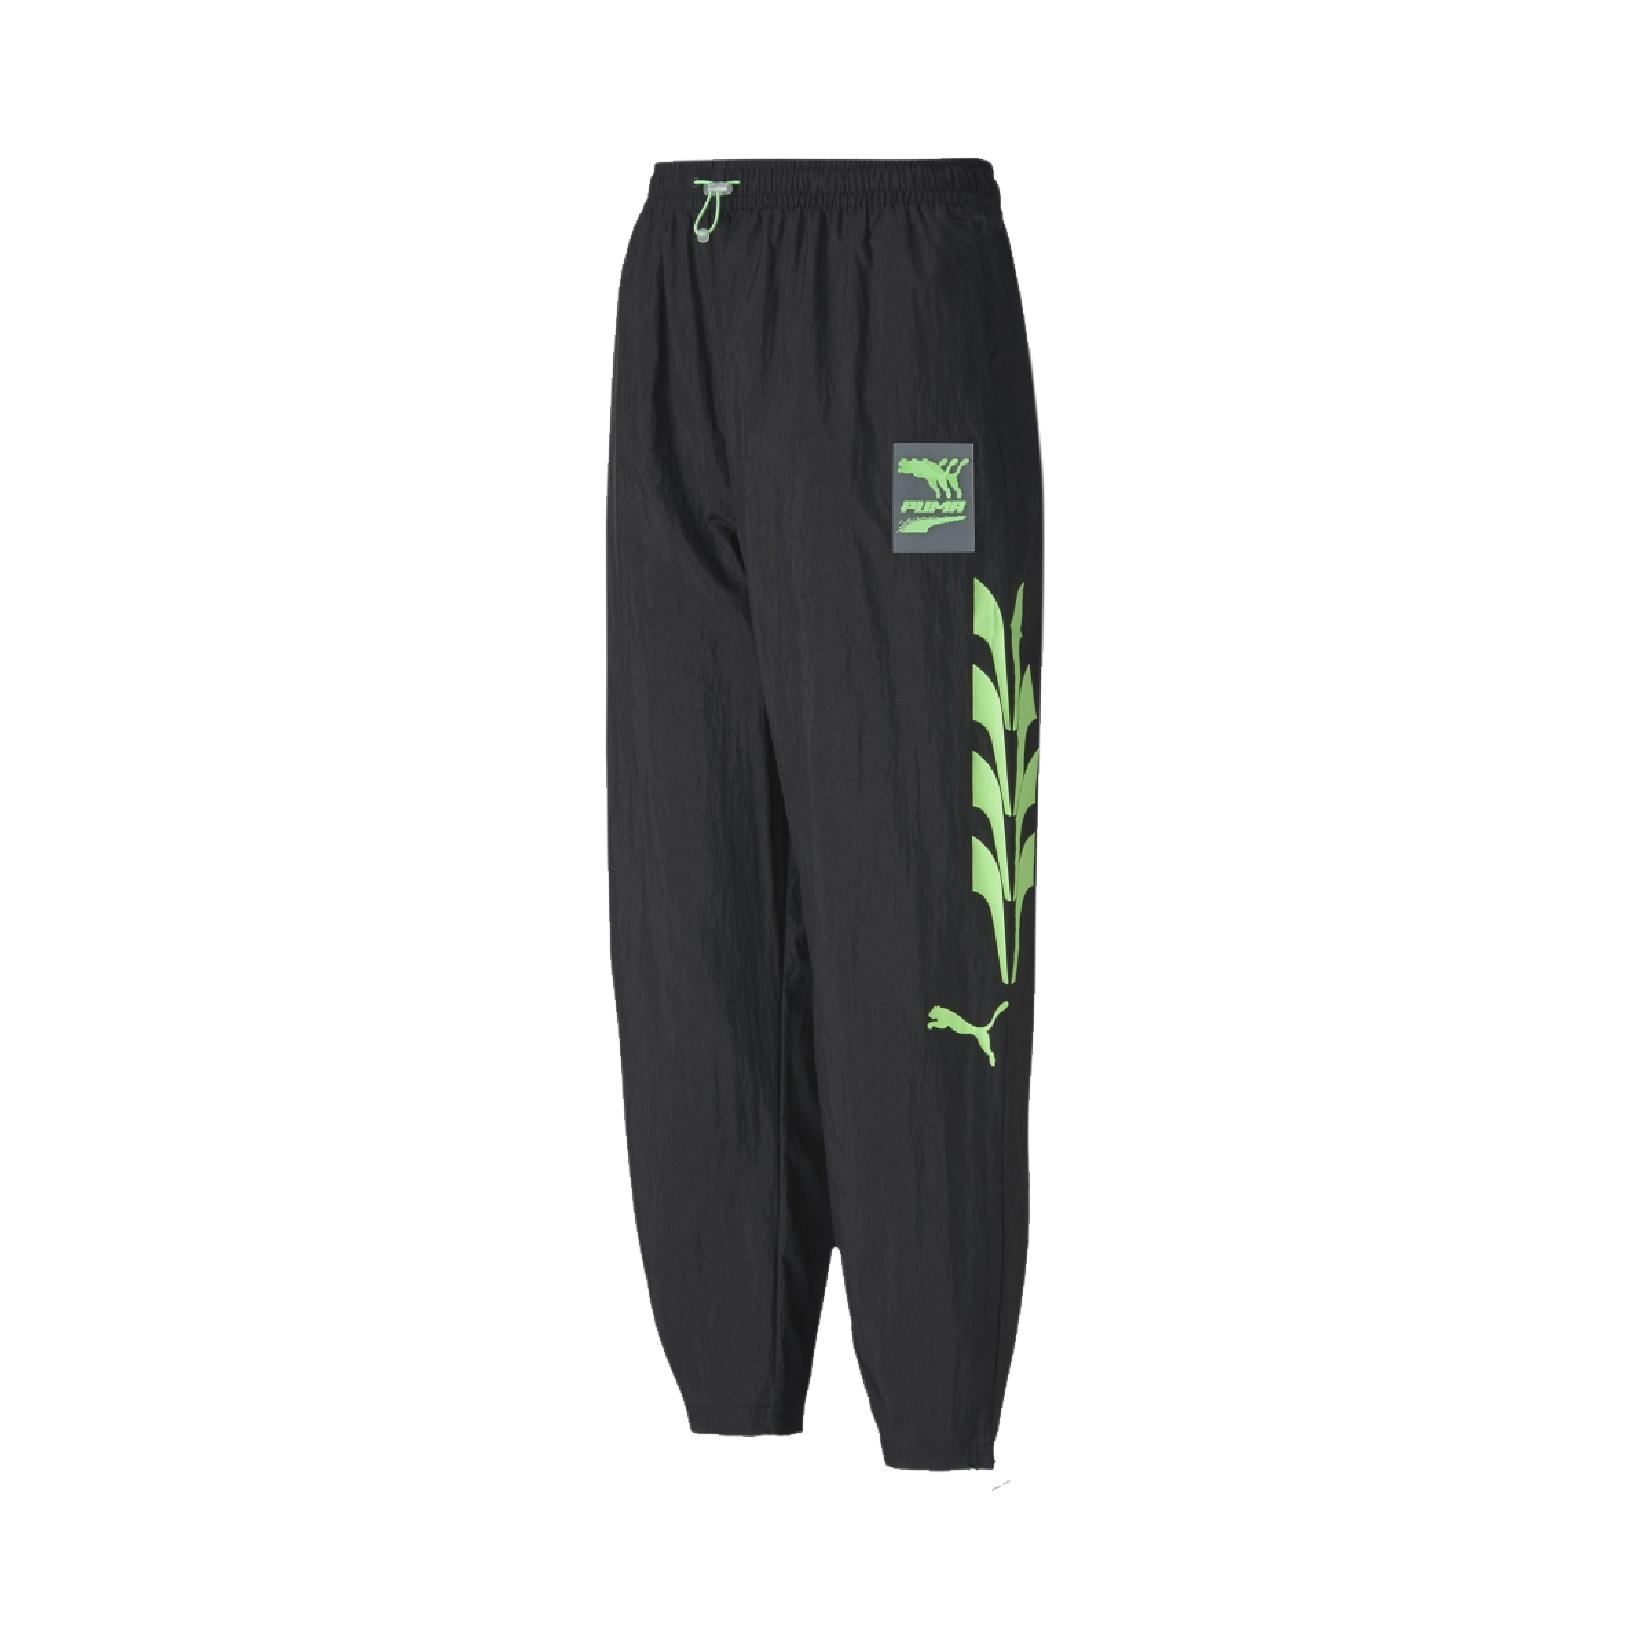 Puma Evide Track Pants Black